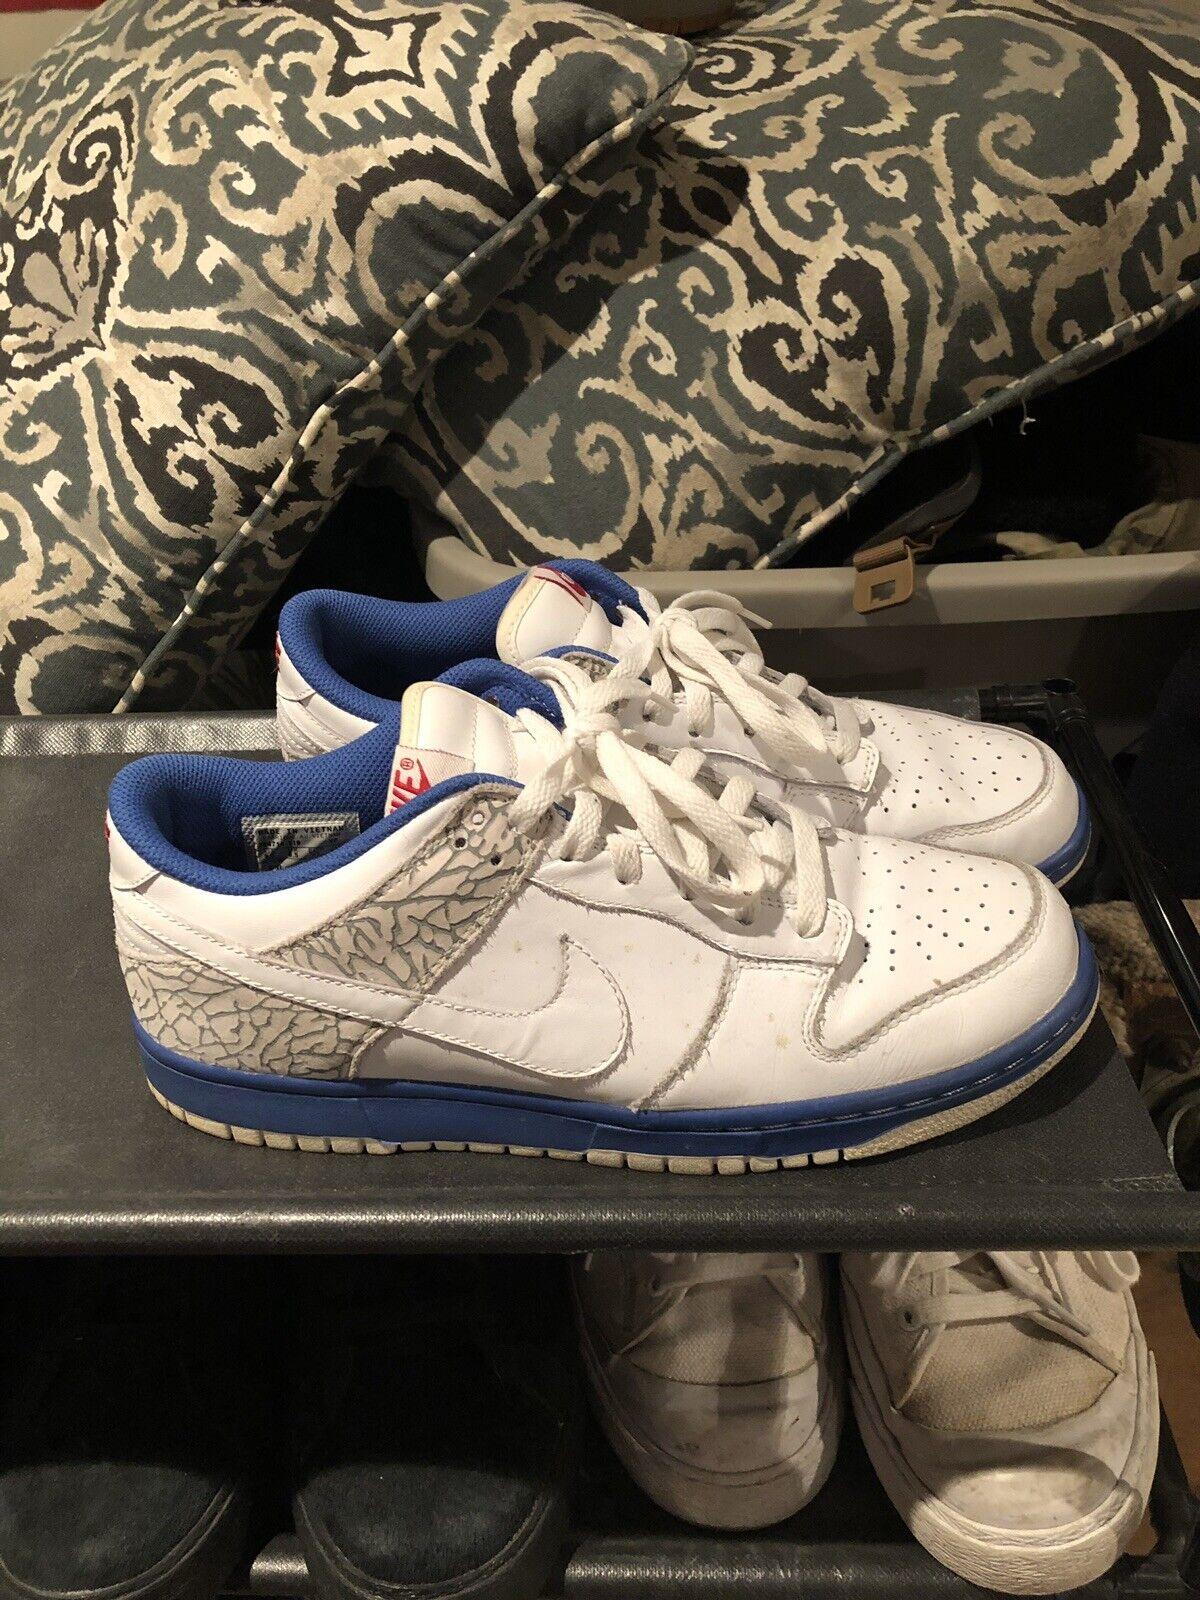 39b638b11b4b7f Nike Air Dunk Low CL Cement True blueee Jordan Jordan Jordan Pack lll Sz  9.5 8aaded